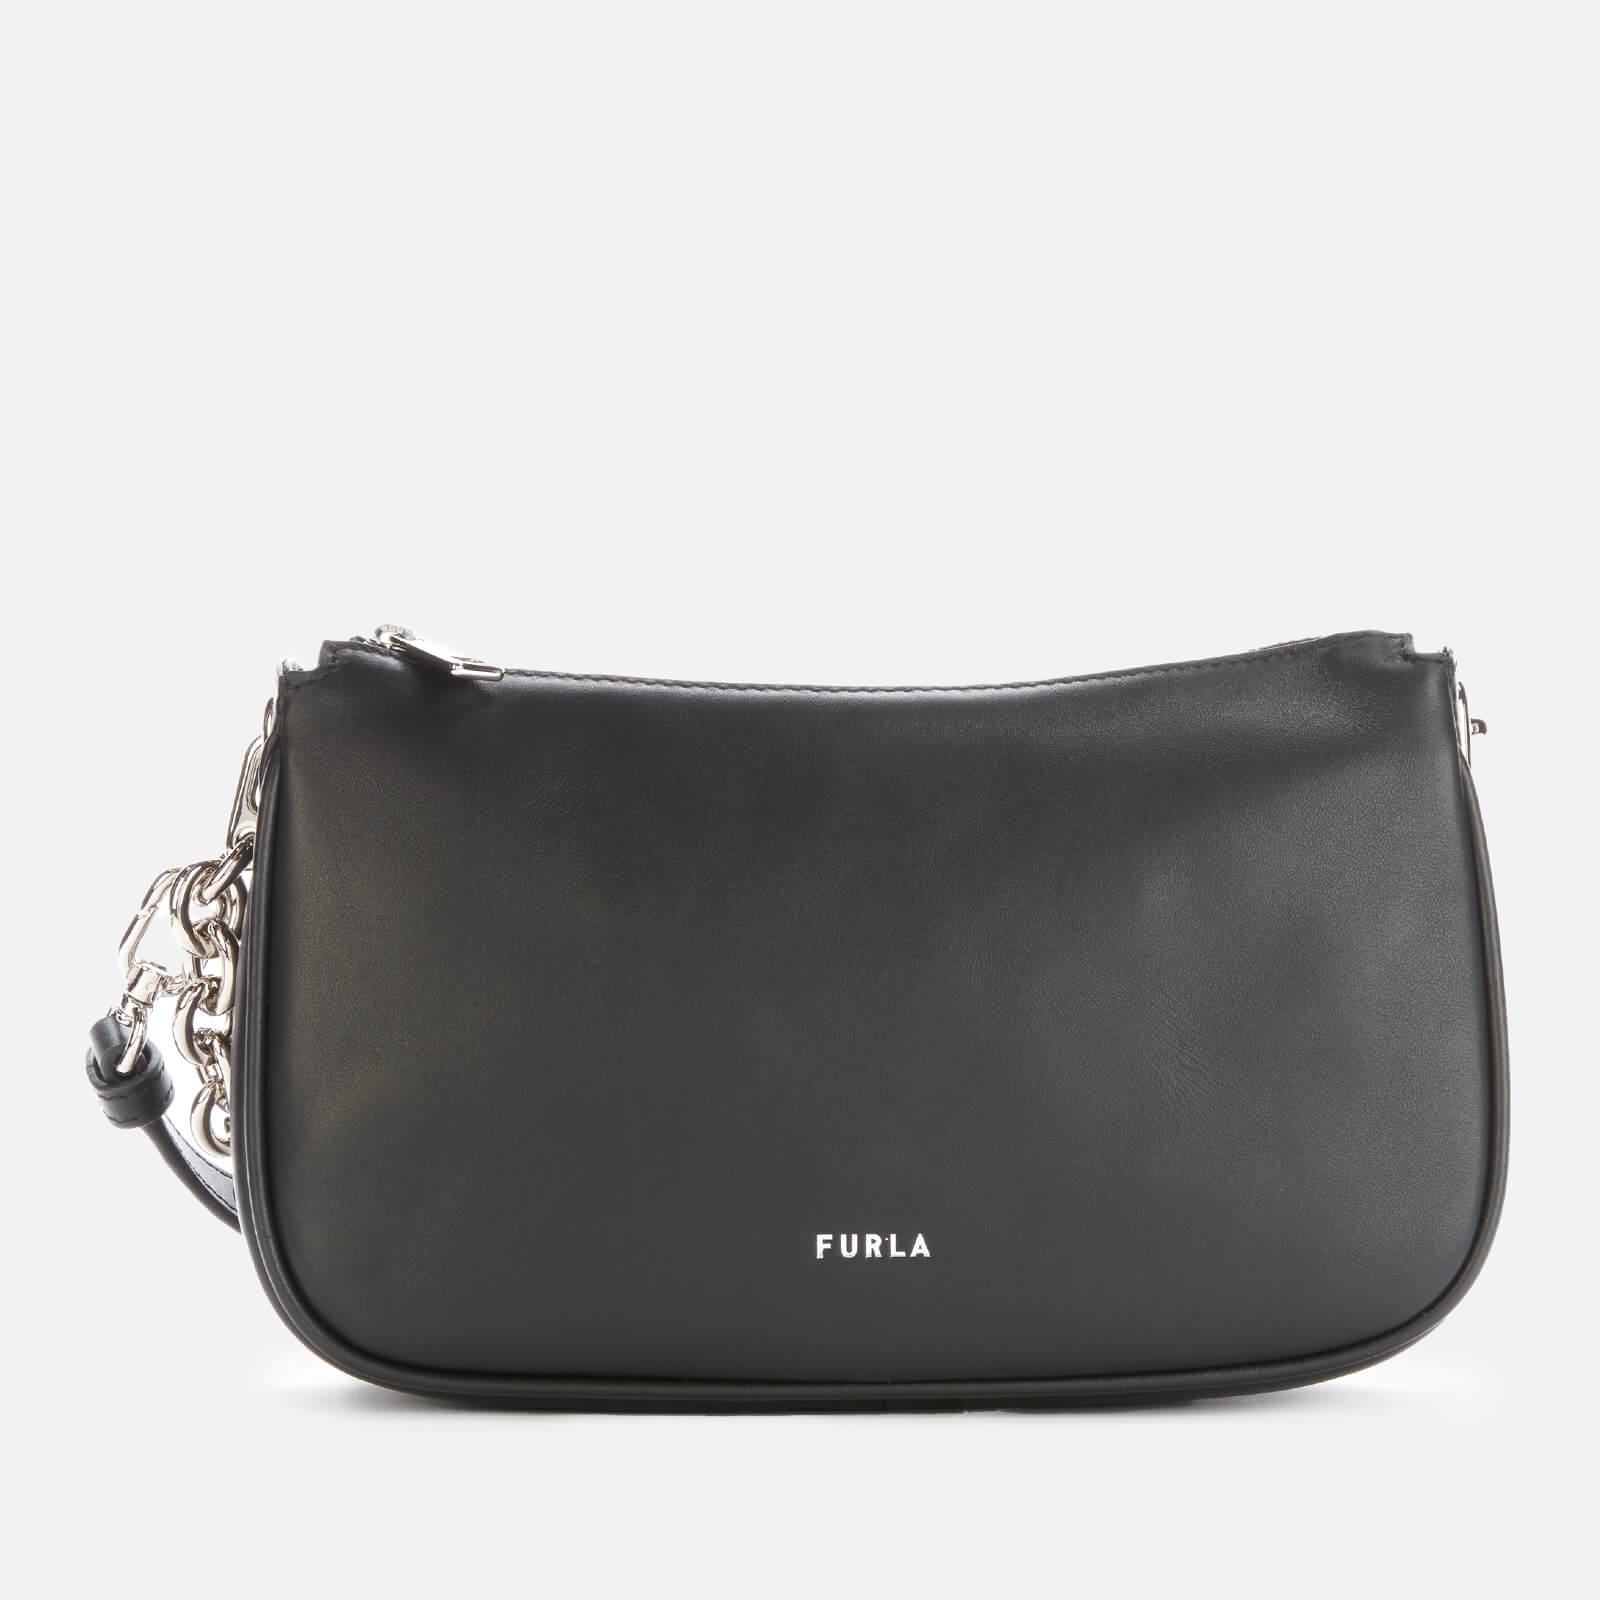 Furla Women's Moon S Shoulder Bag - Black